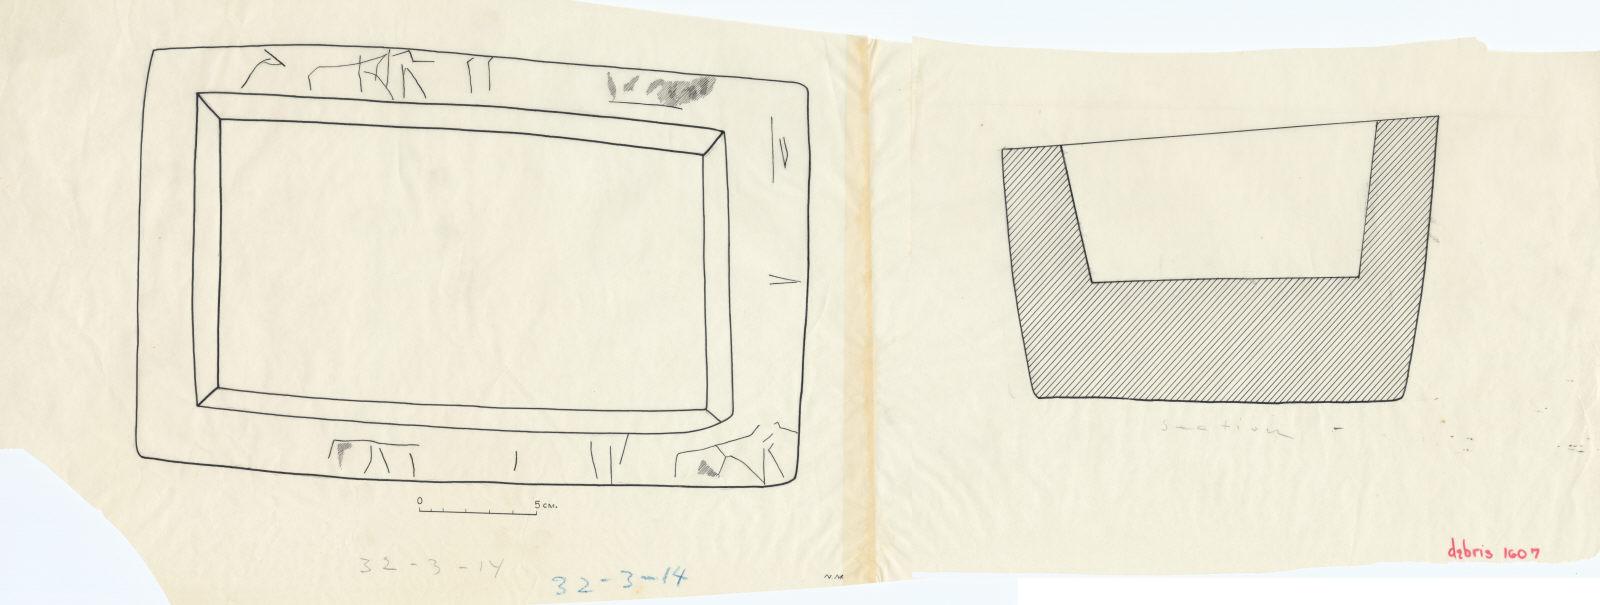 Drawings: G 1607: offering basin of Ian